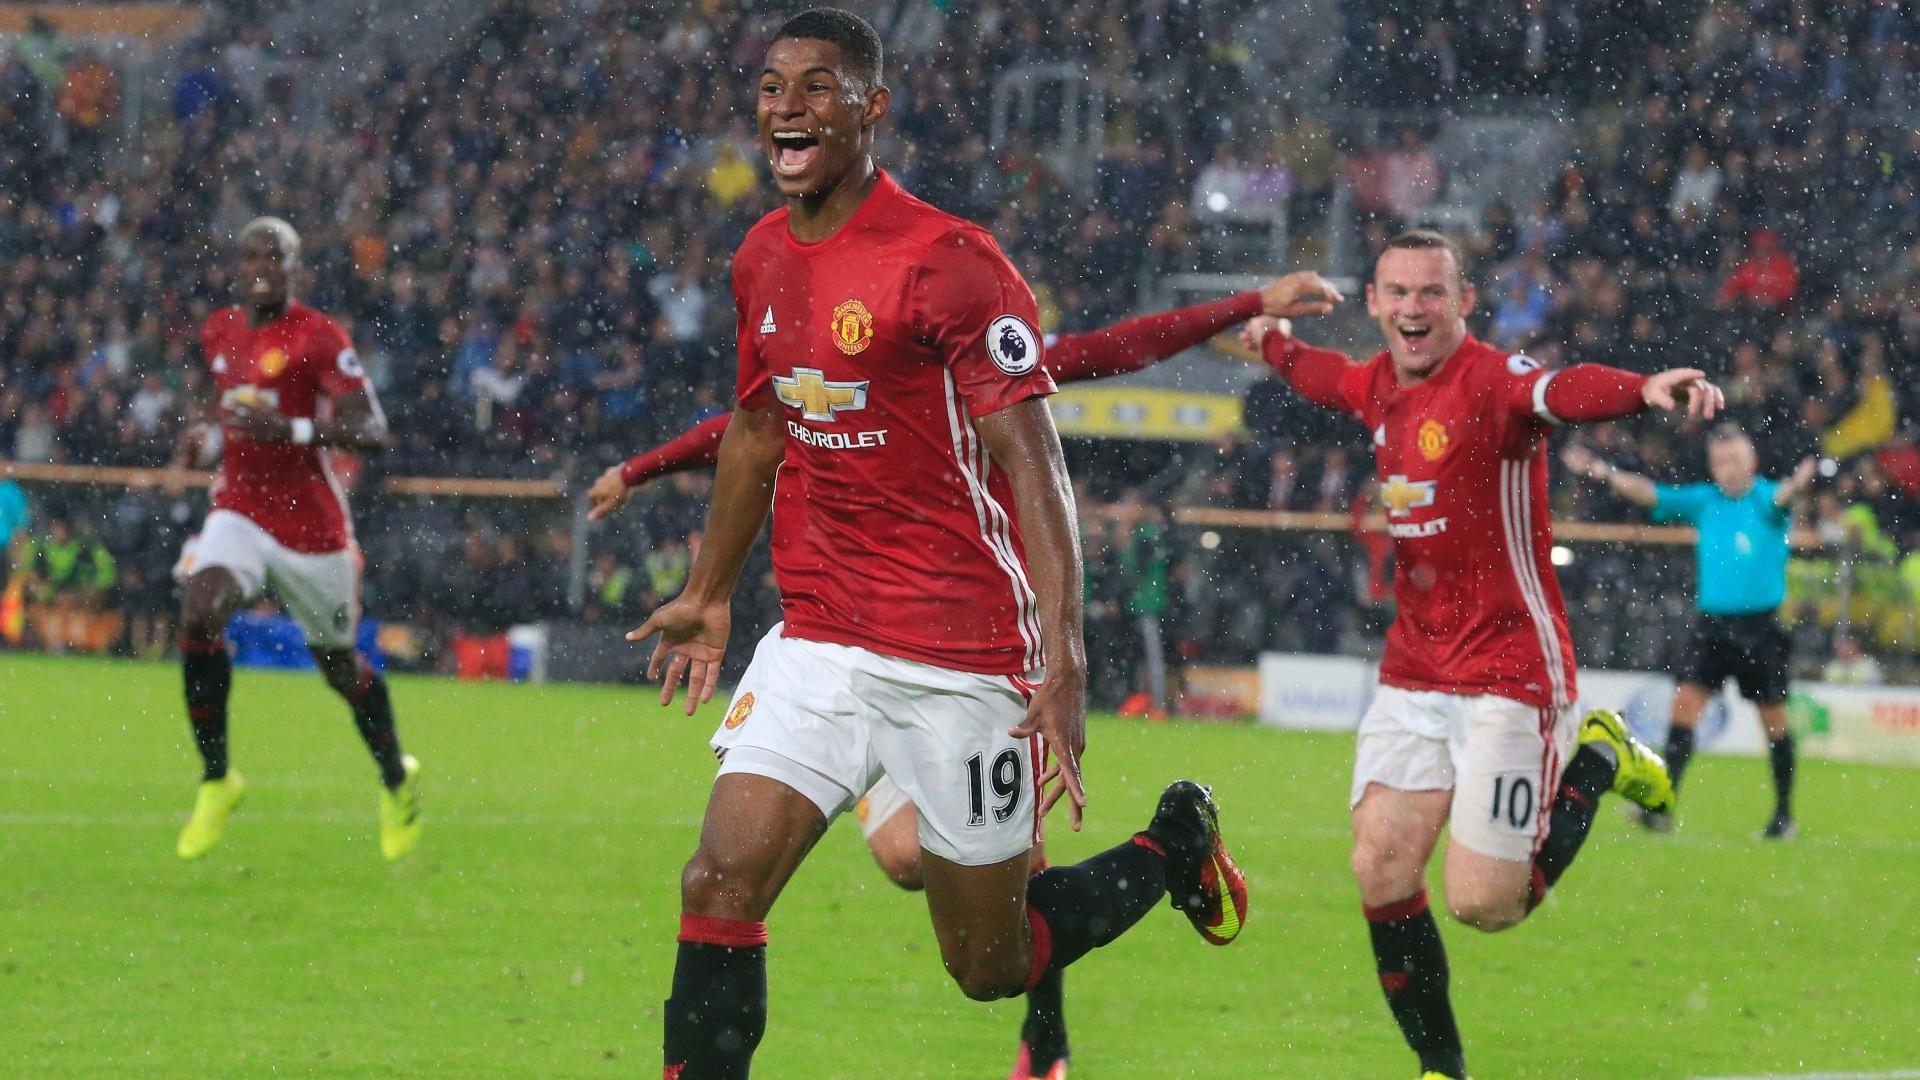 Rashford comemora após marcar para o United